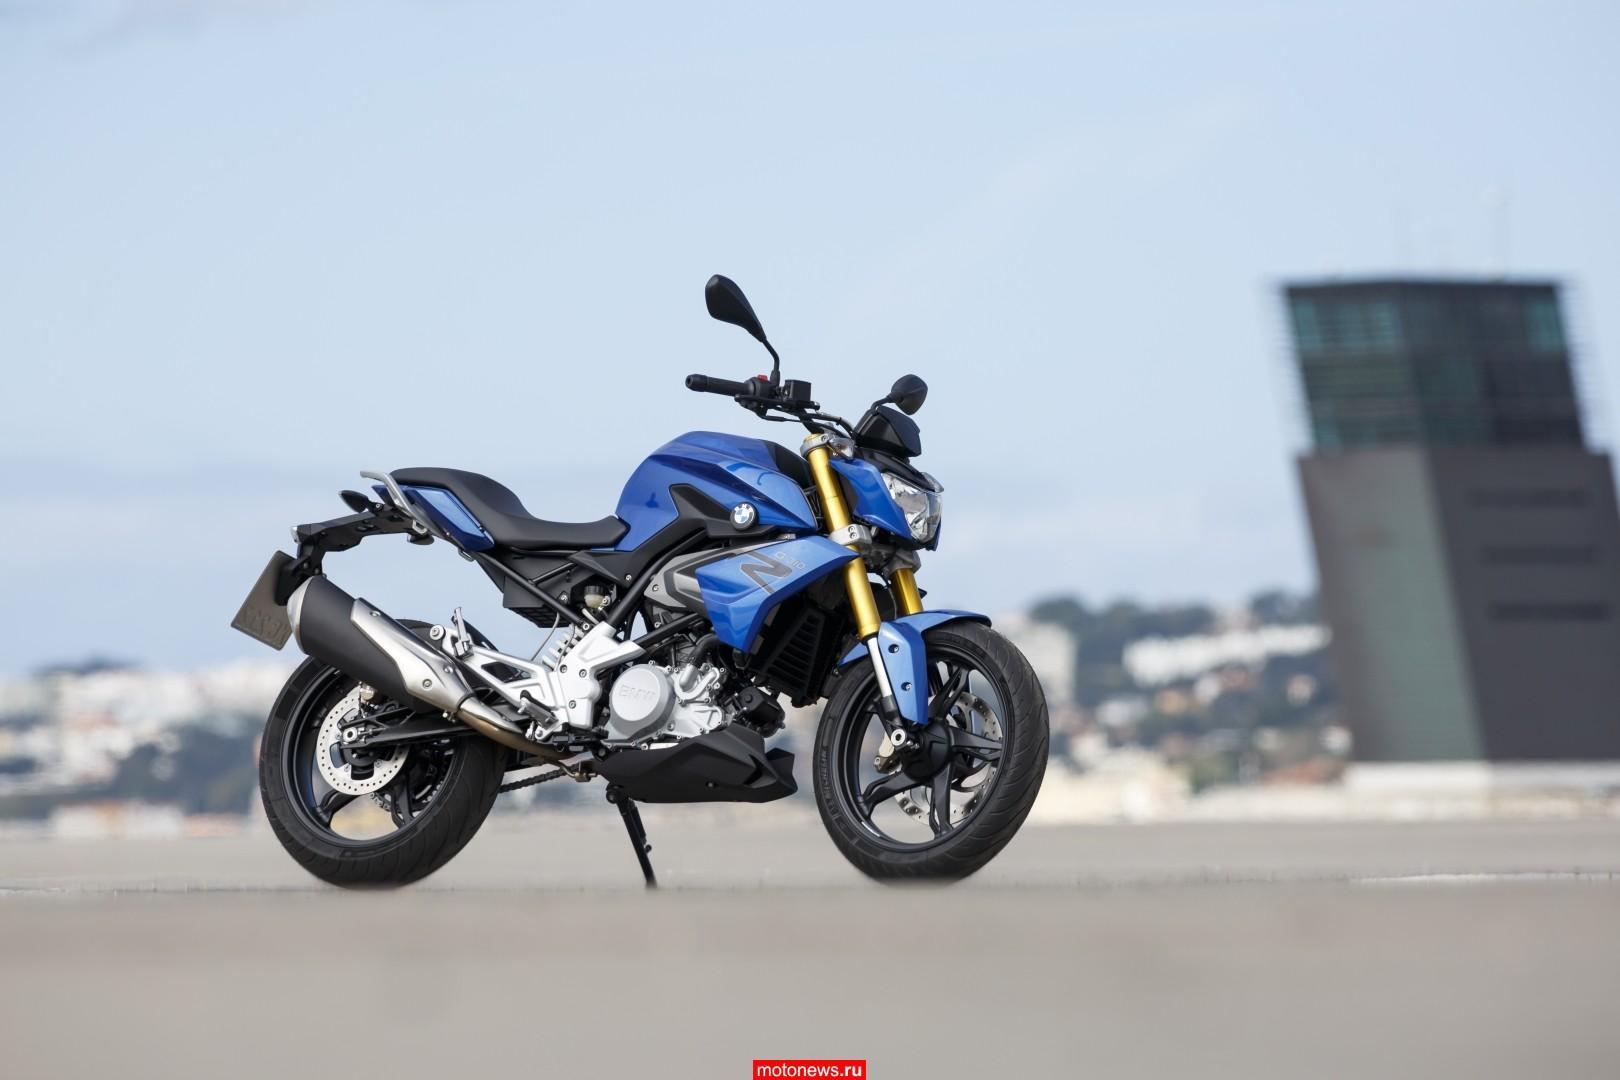 Мотоцикл БМВ g310r #10